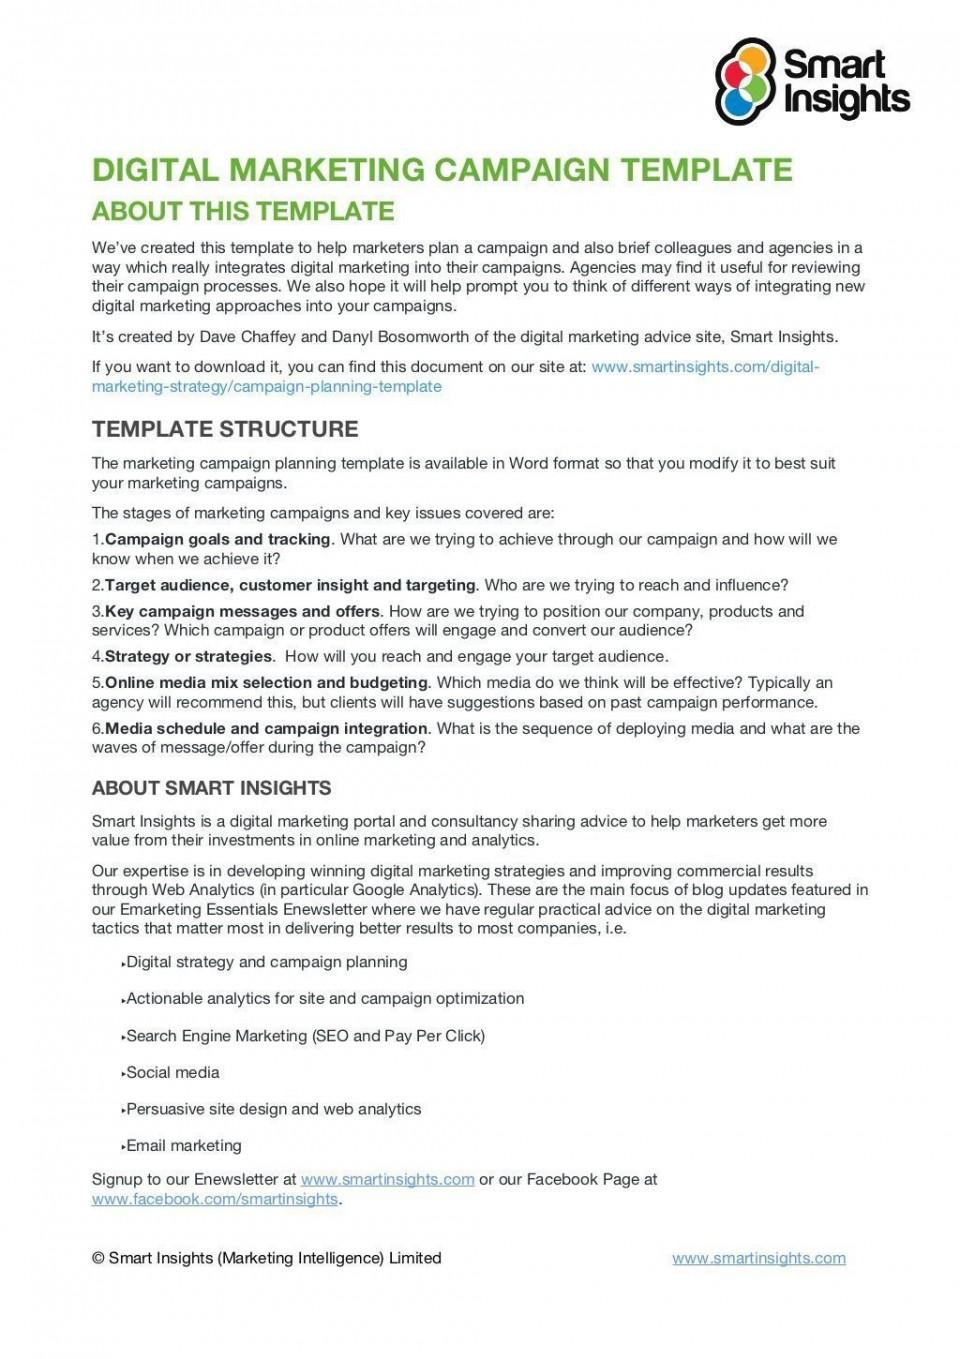 008 Impressive Social Media Marketing Plan Template Doc Image 960